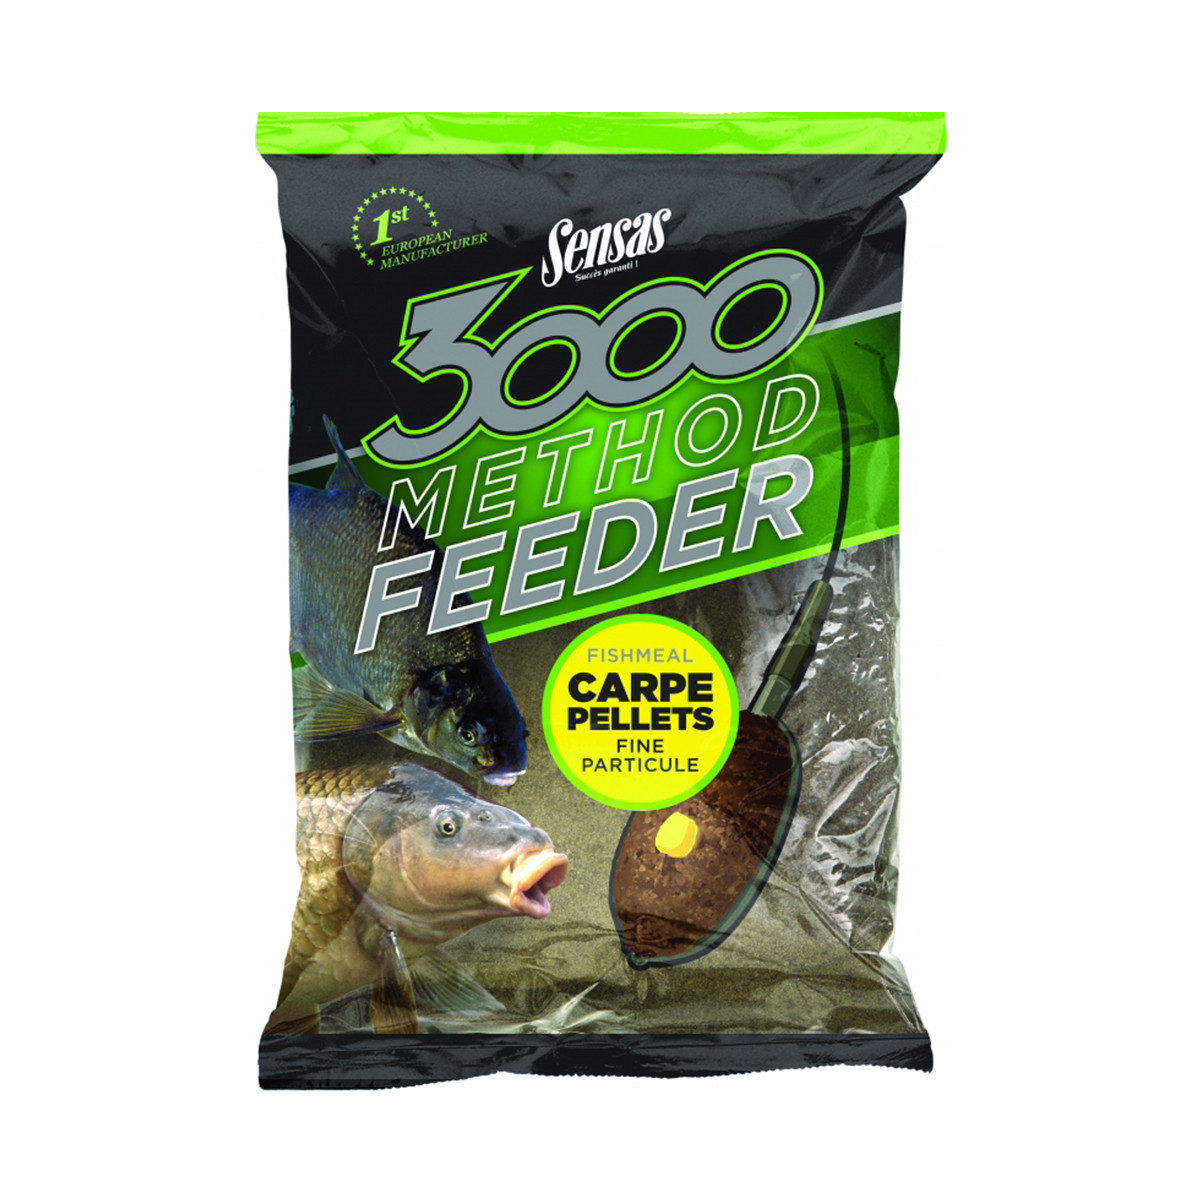 SENSAS 3000 METHOD FEEDER